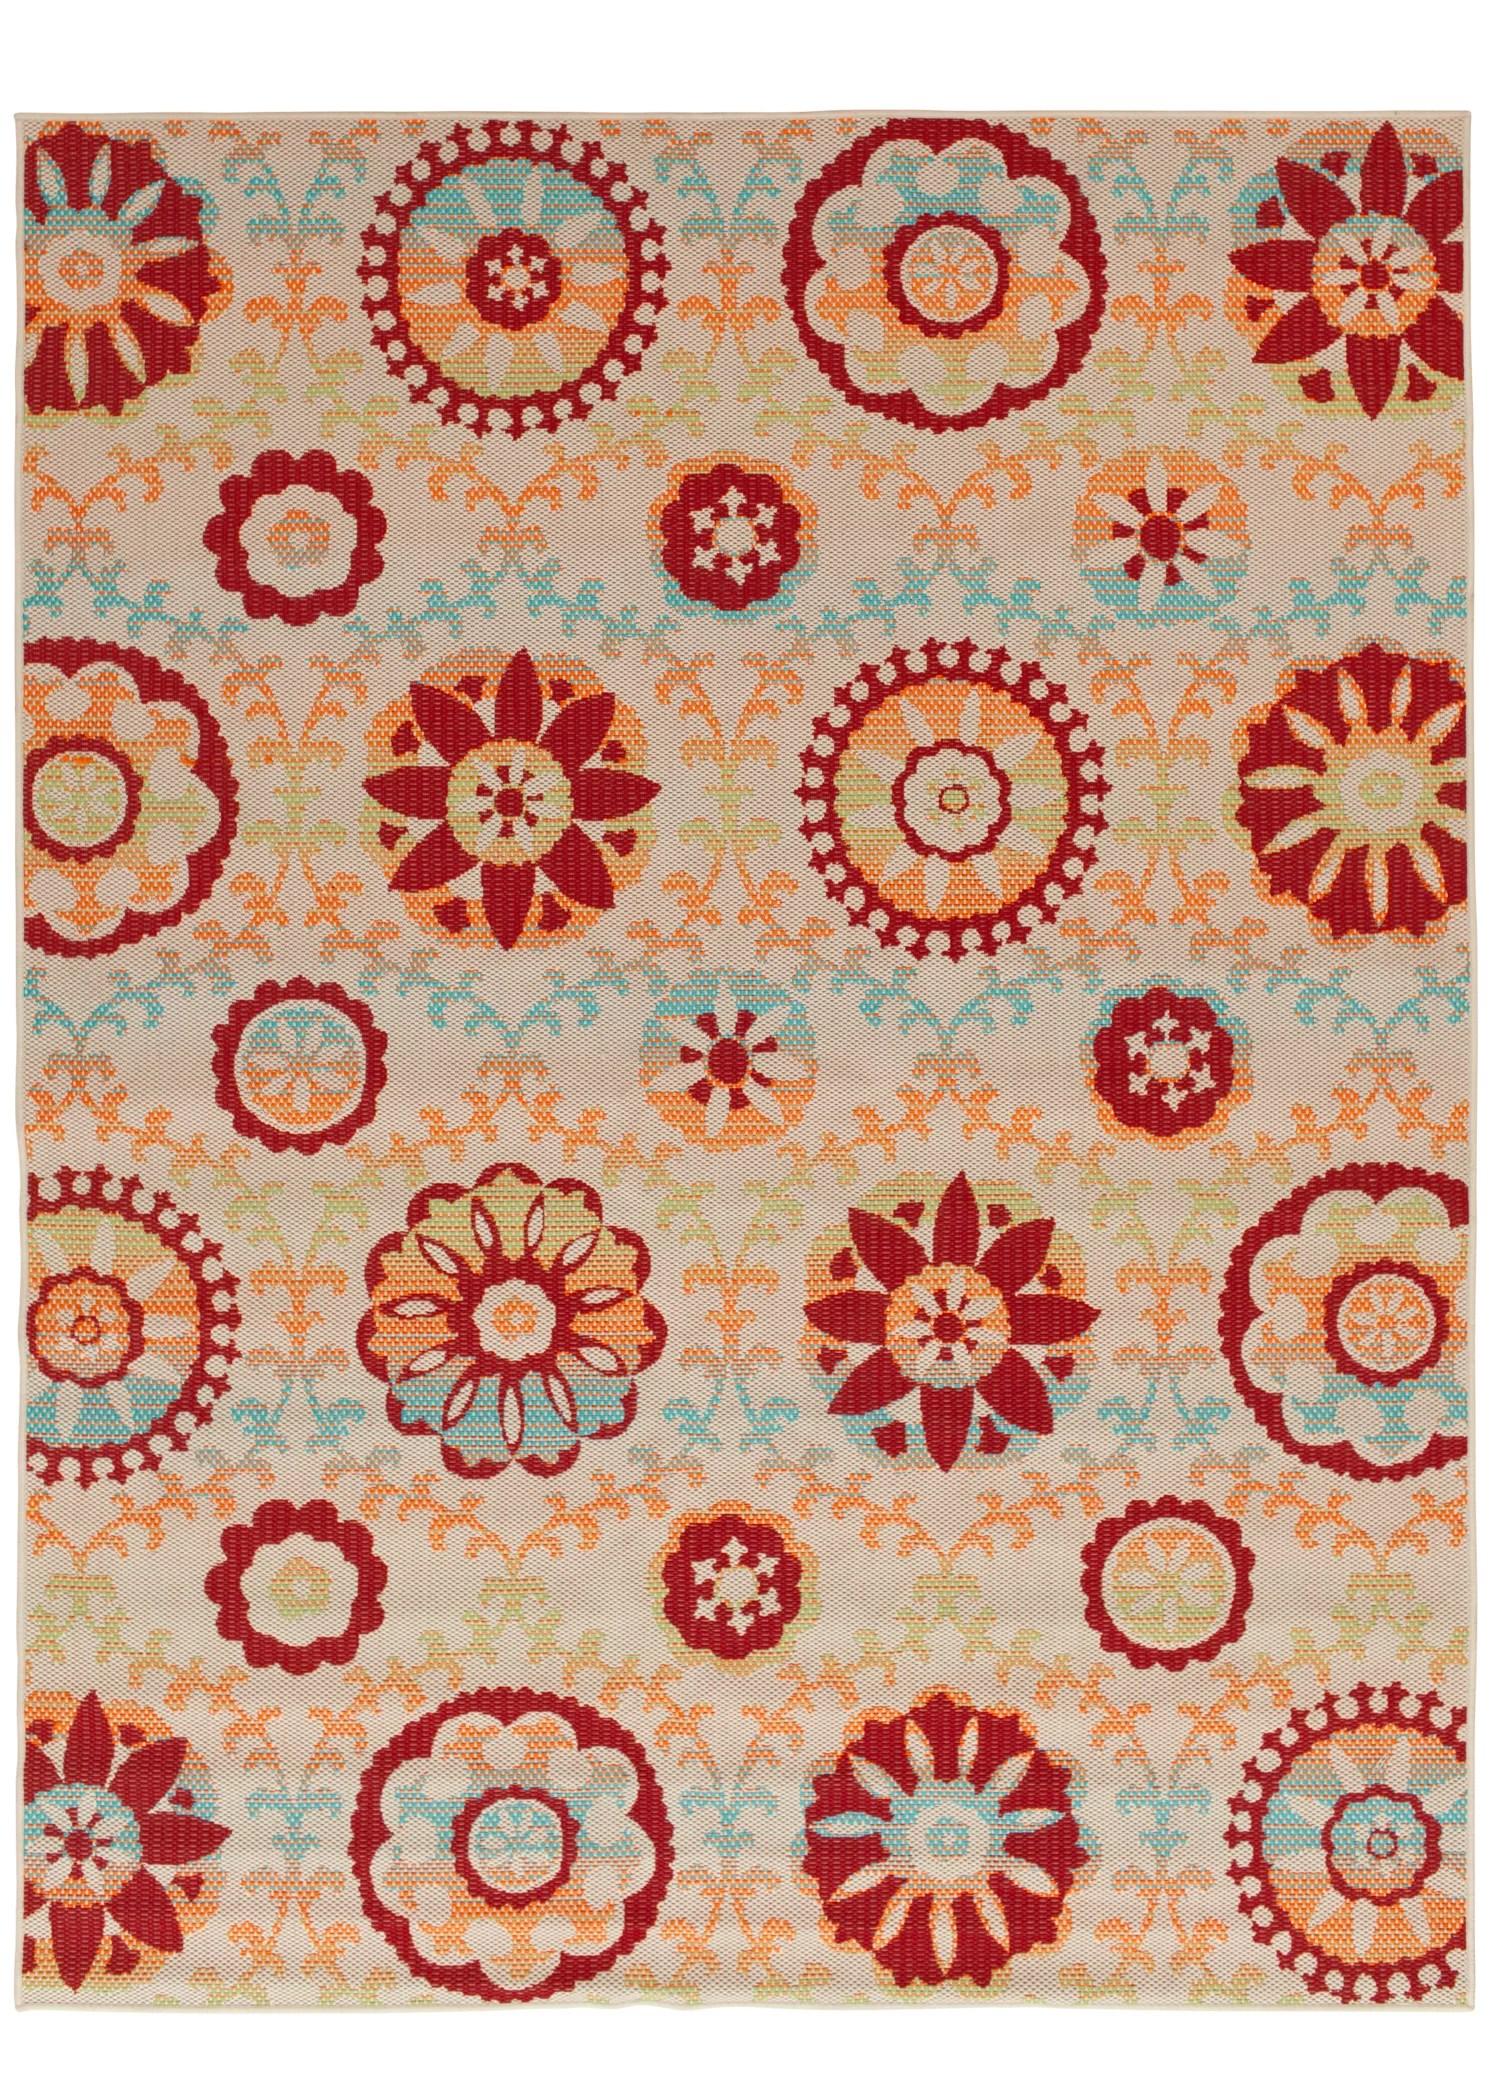 mainstays 7 2 x10 multi color floral medallion indoor outdoor area rug